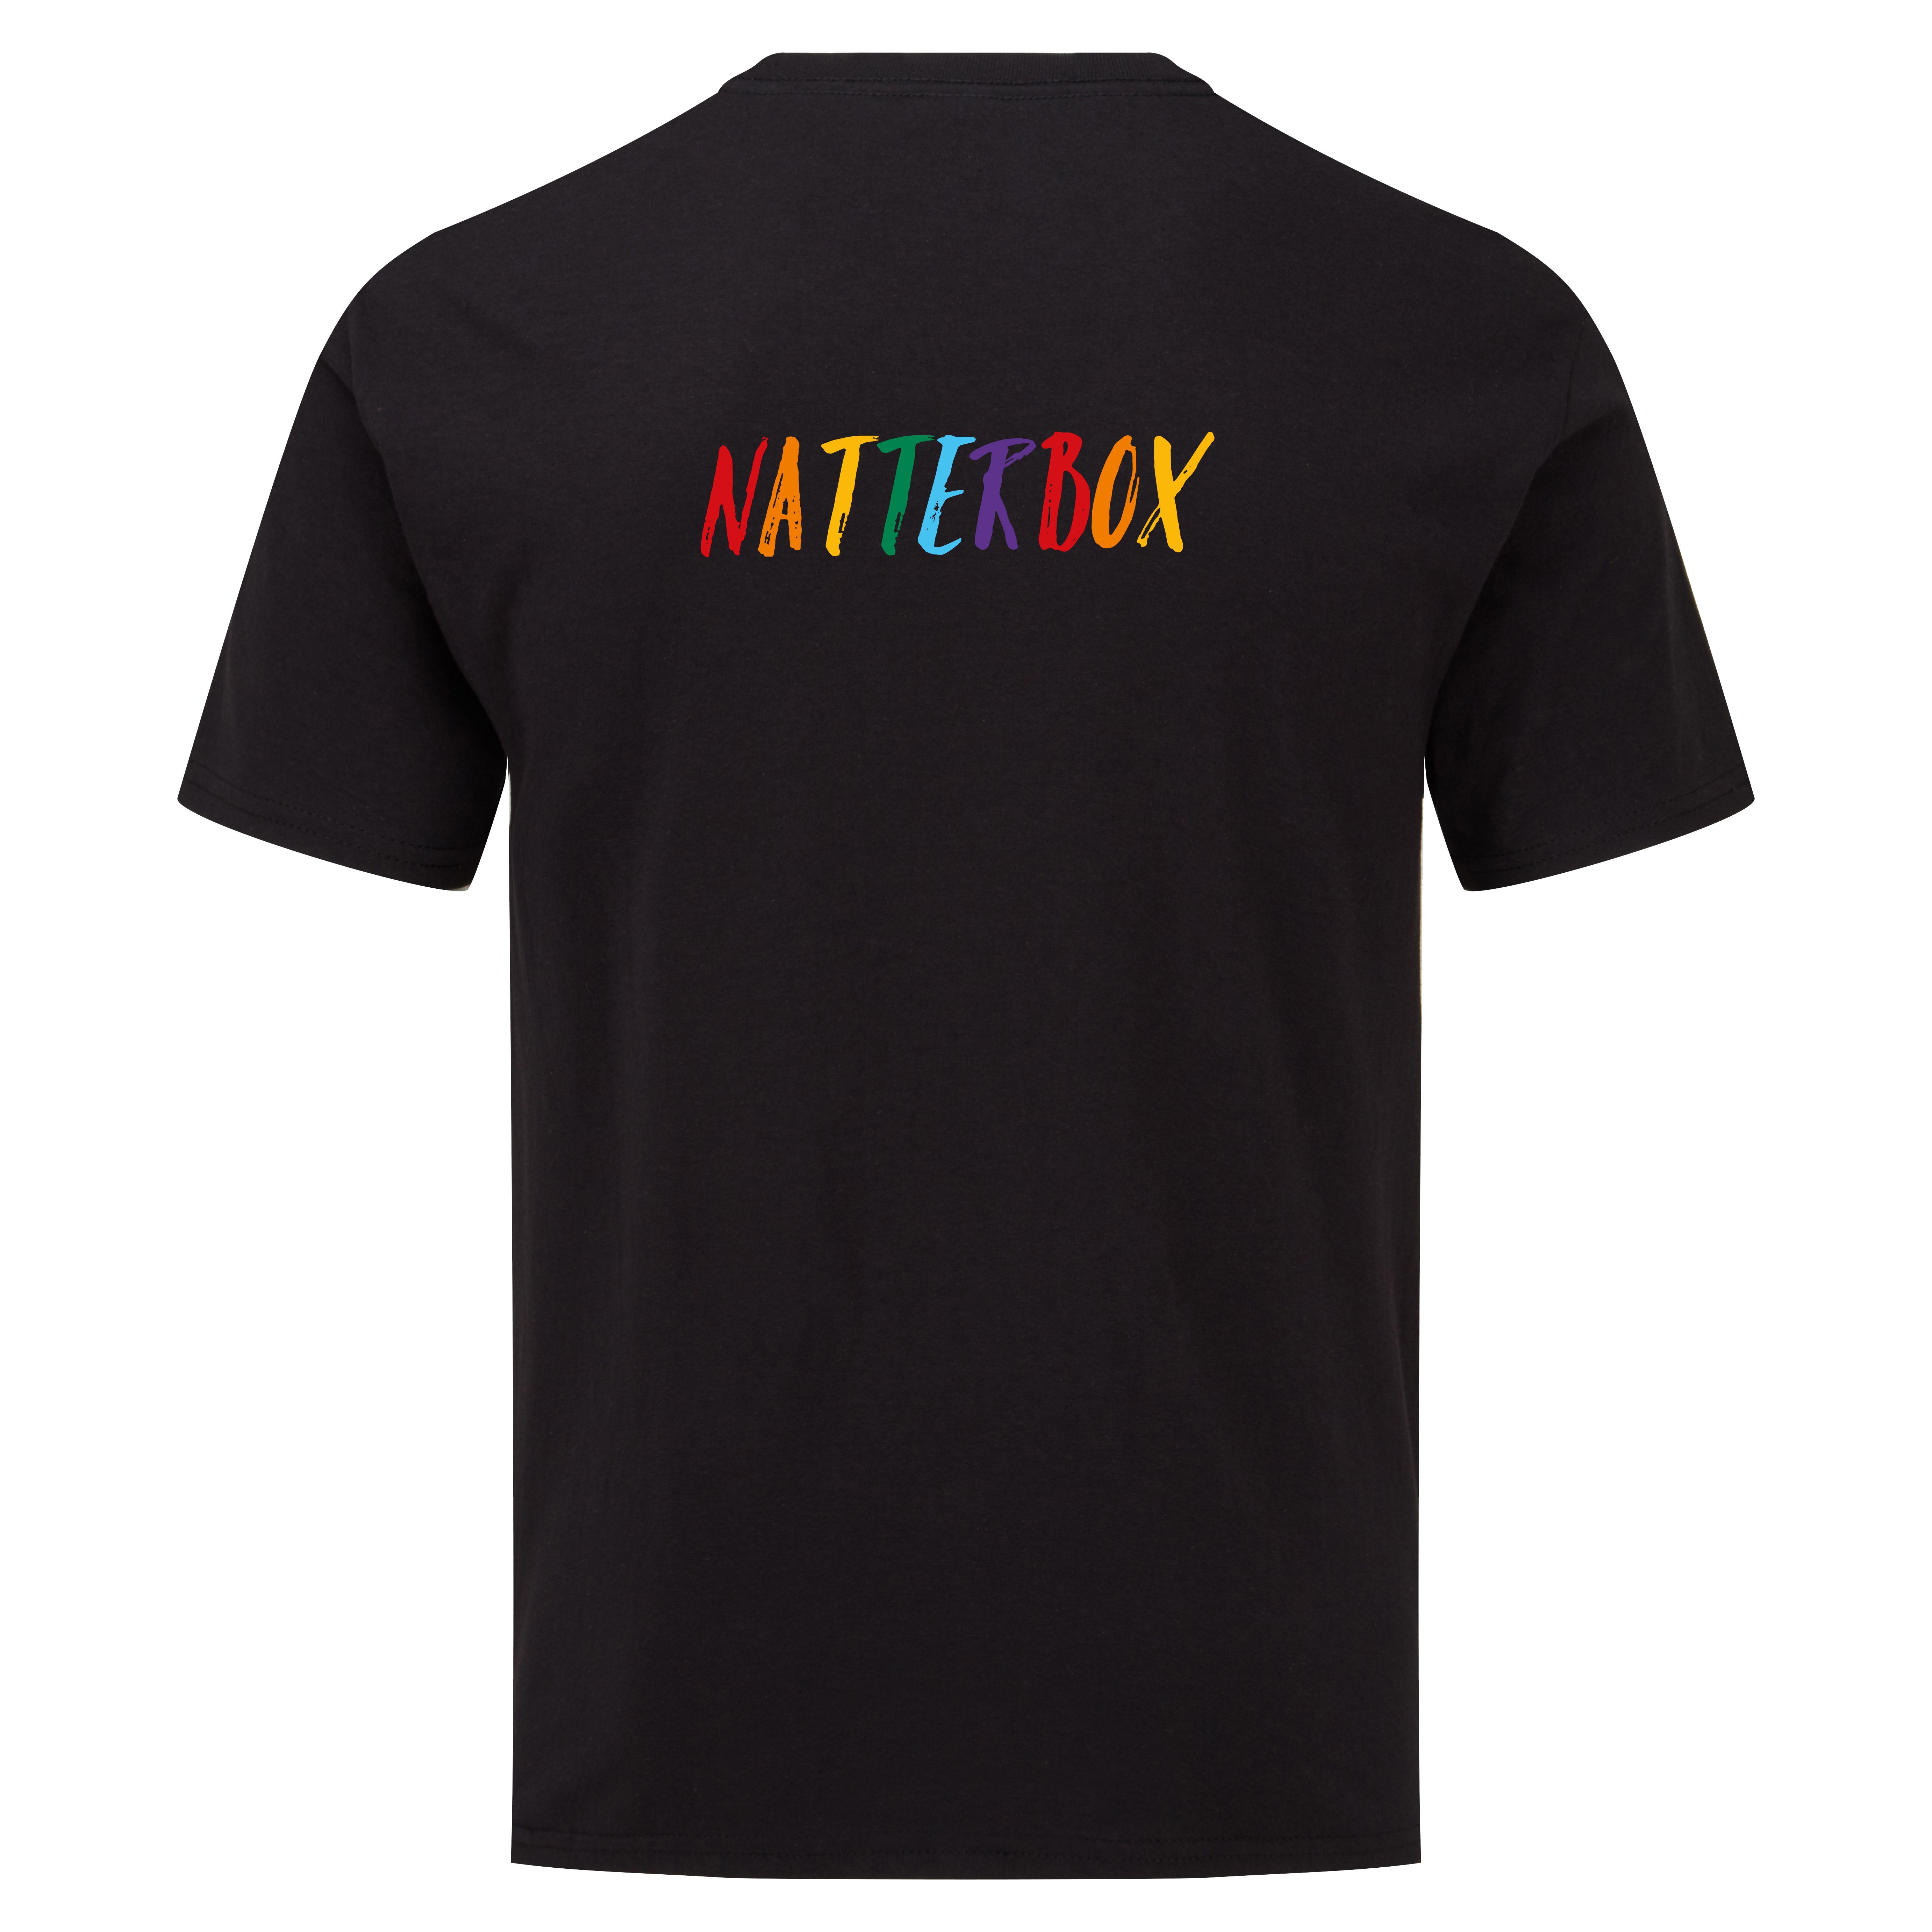 NatterBox-001 T shirt